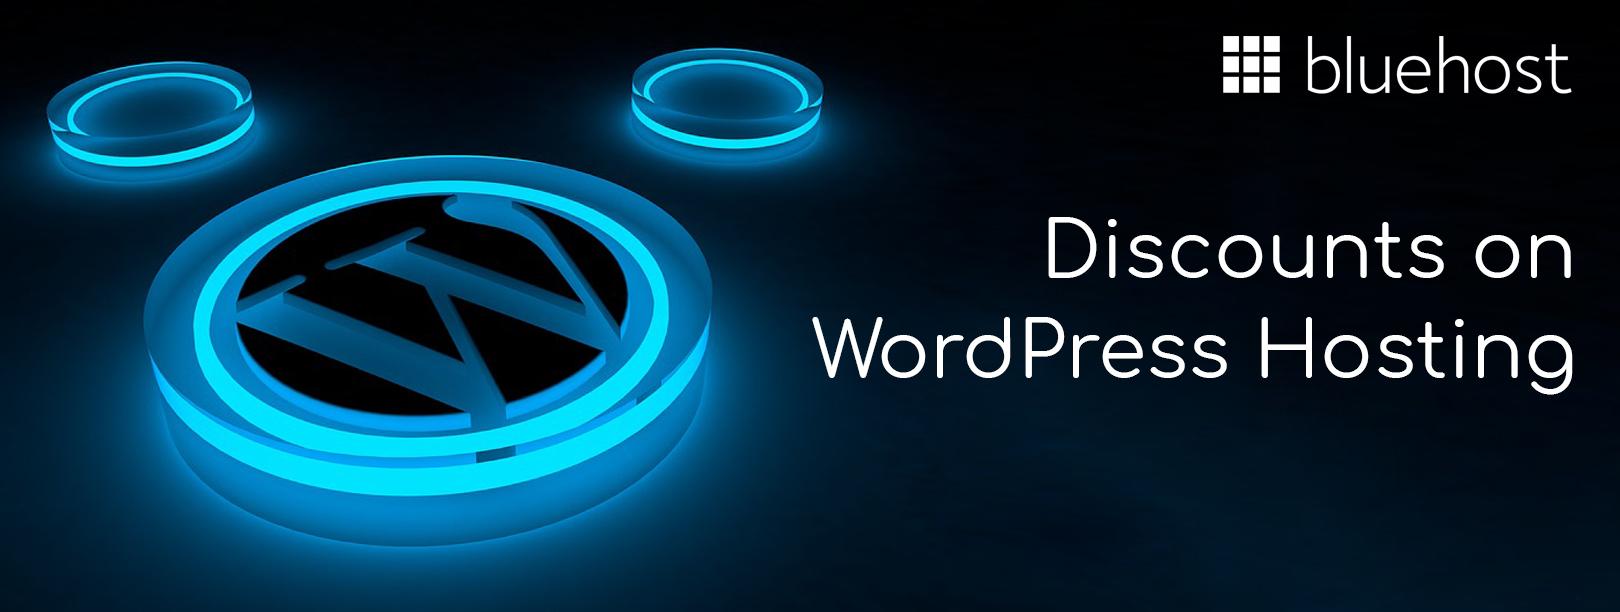 Bluehost WordPress Hosting